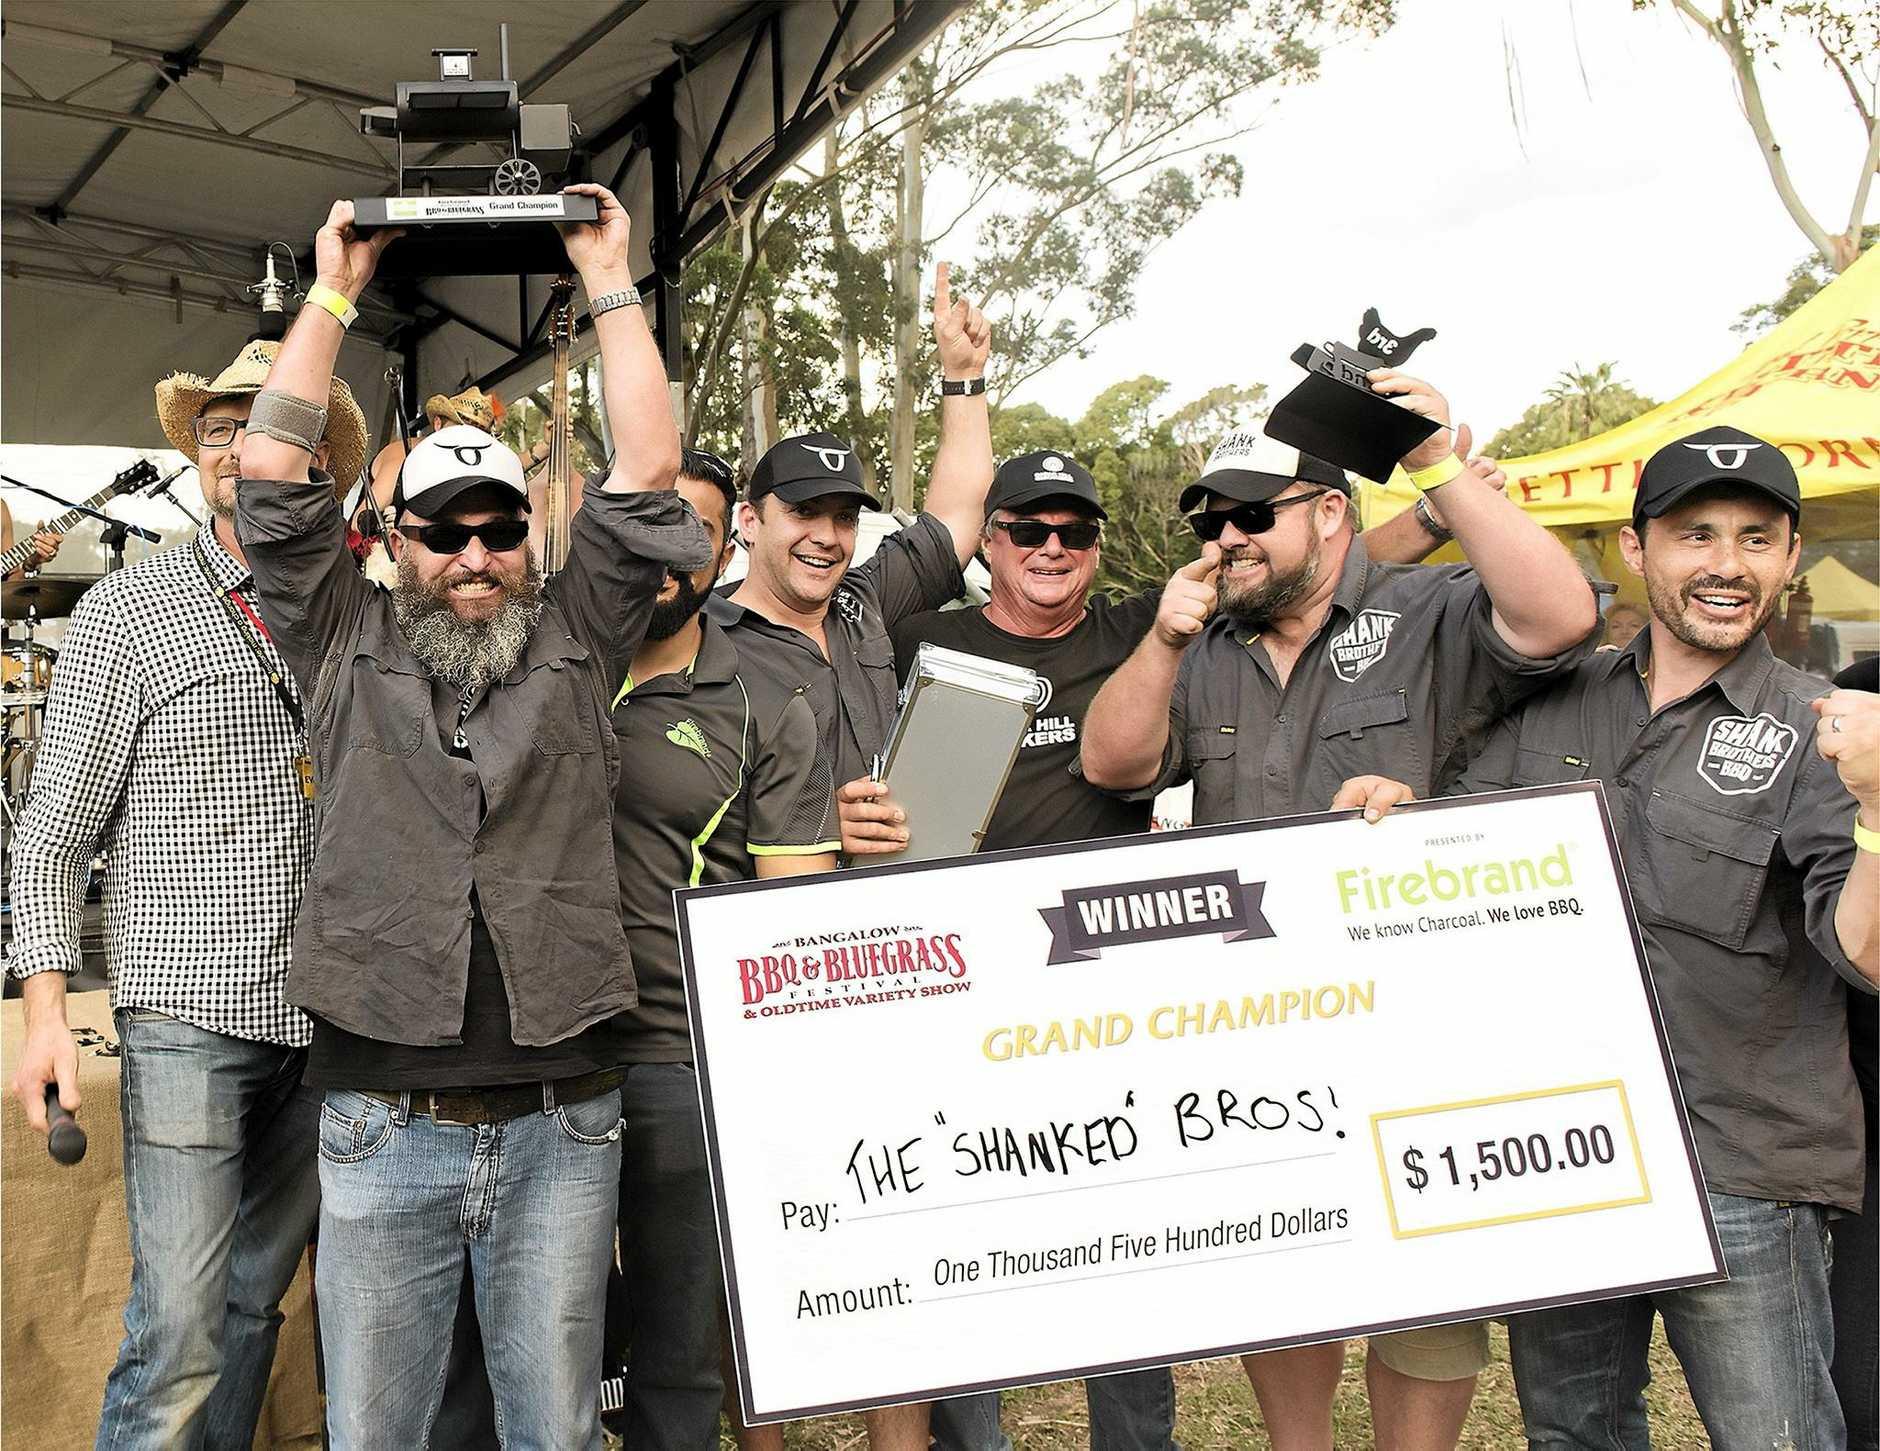 CHAMPIONS: The Shanked Brothers BBQ won the $1500 Firebrand BBQ Grand Championship.